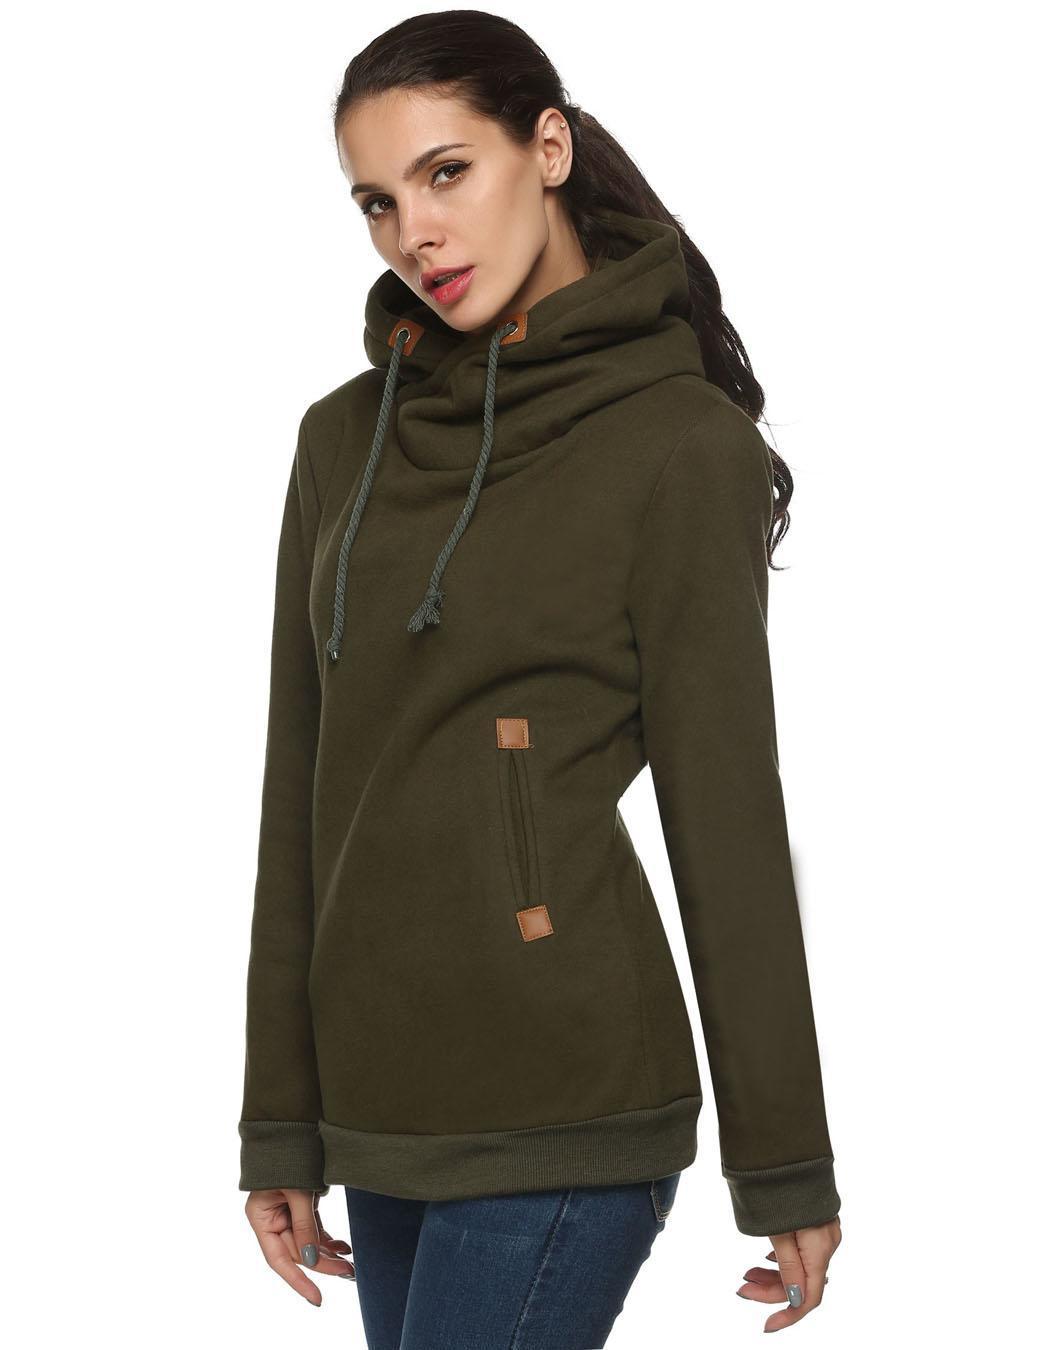 Women Long Sleeve Casual Pullover Hooded Sweatershirt Hoodies 3